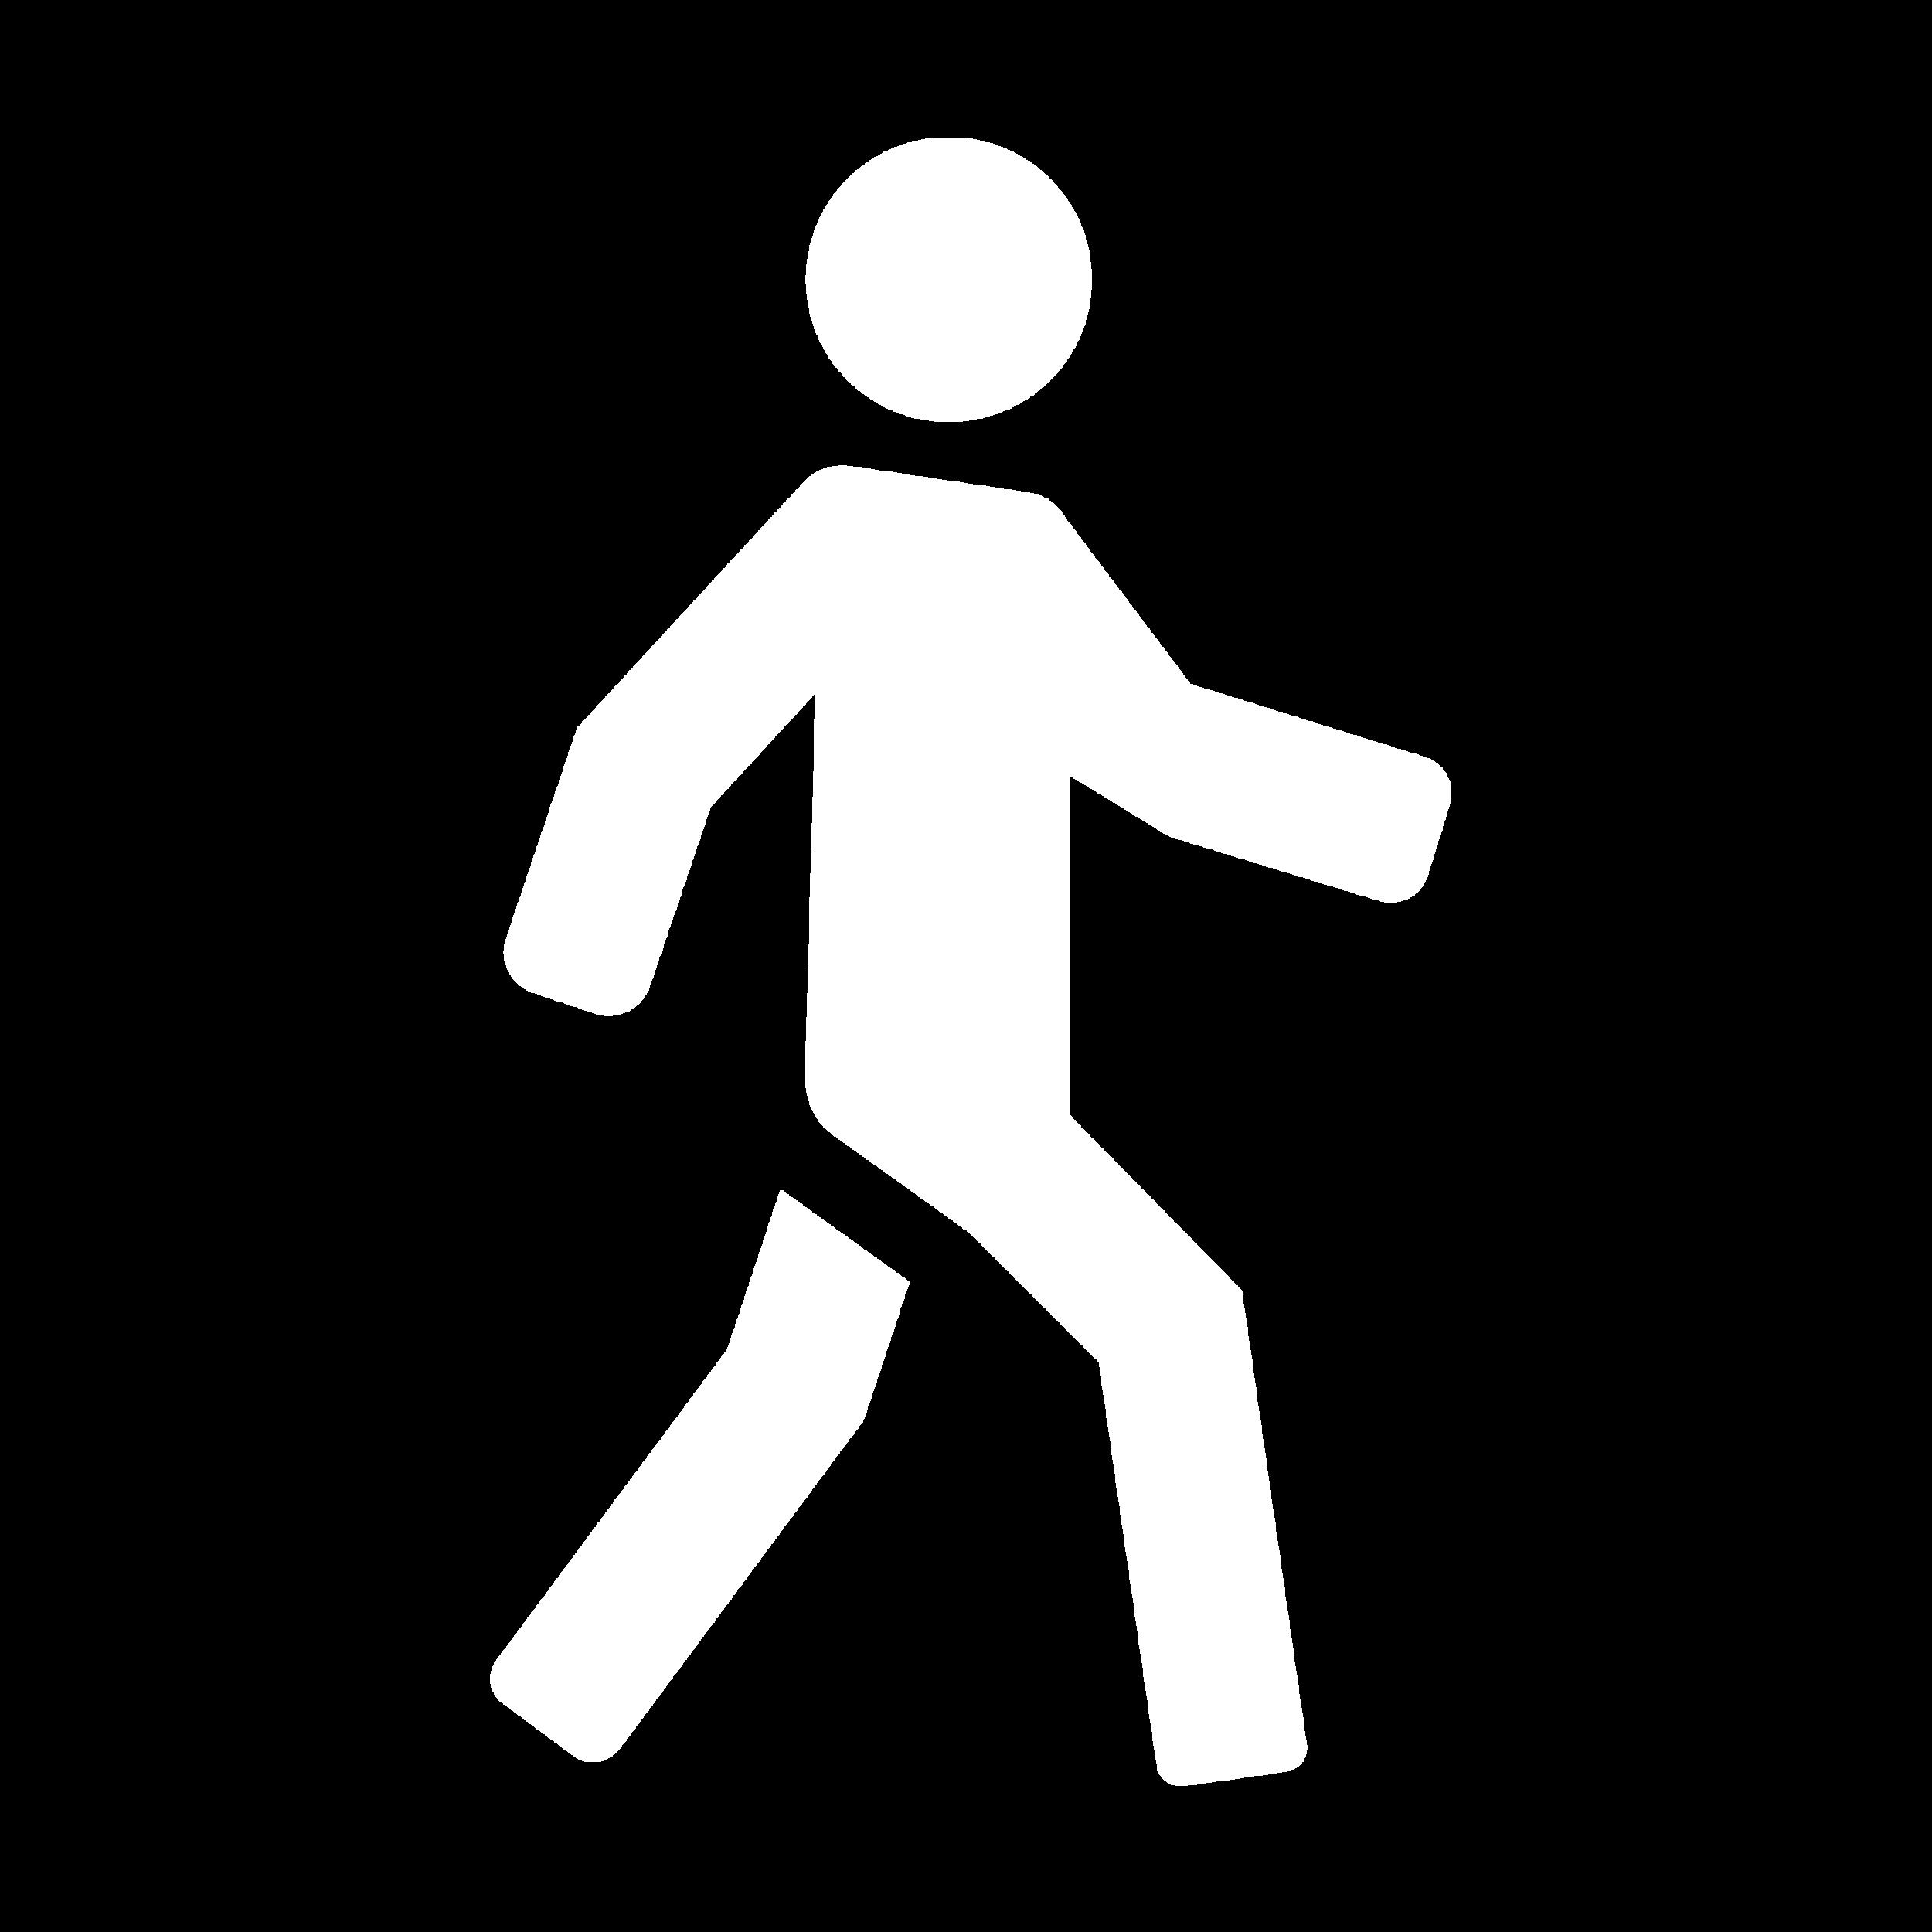 Walk-01-01.png